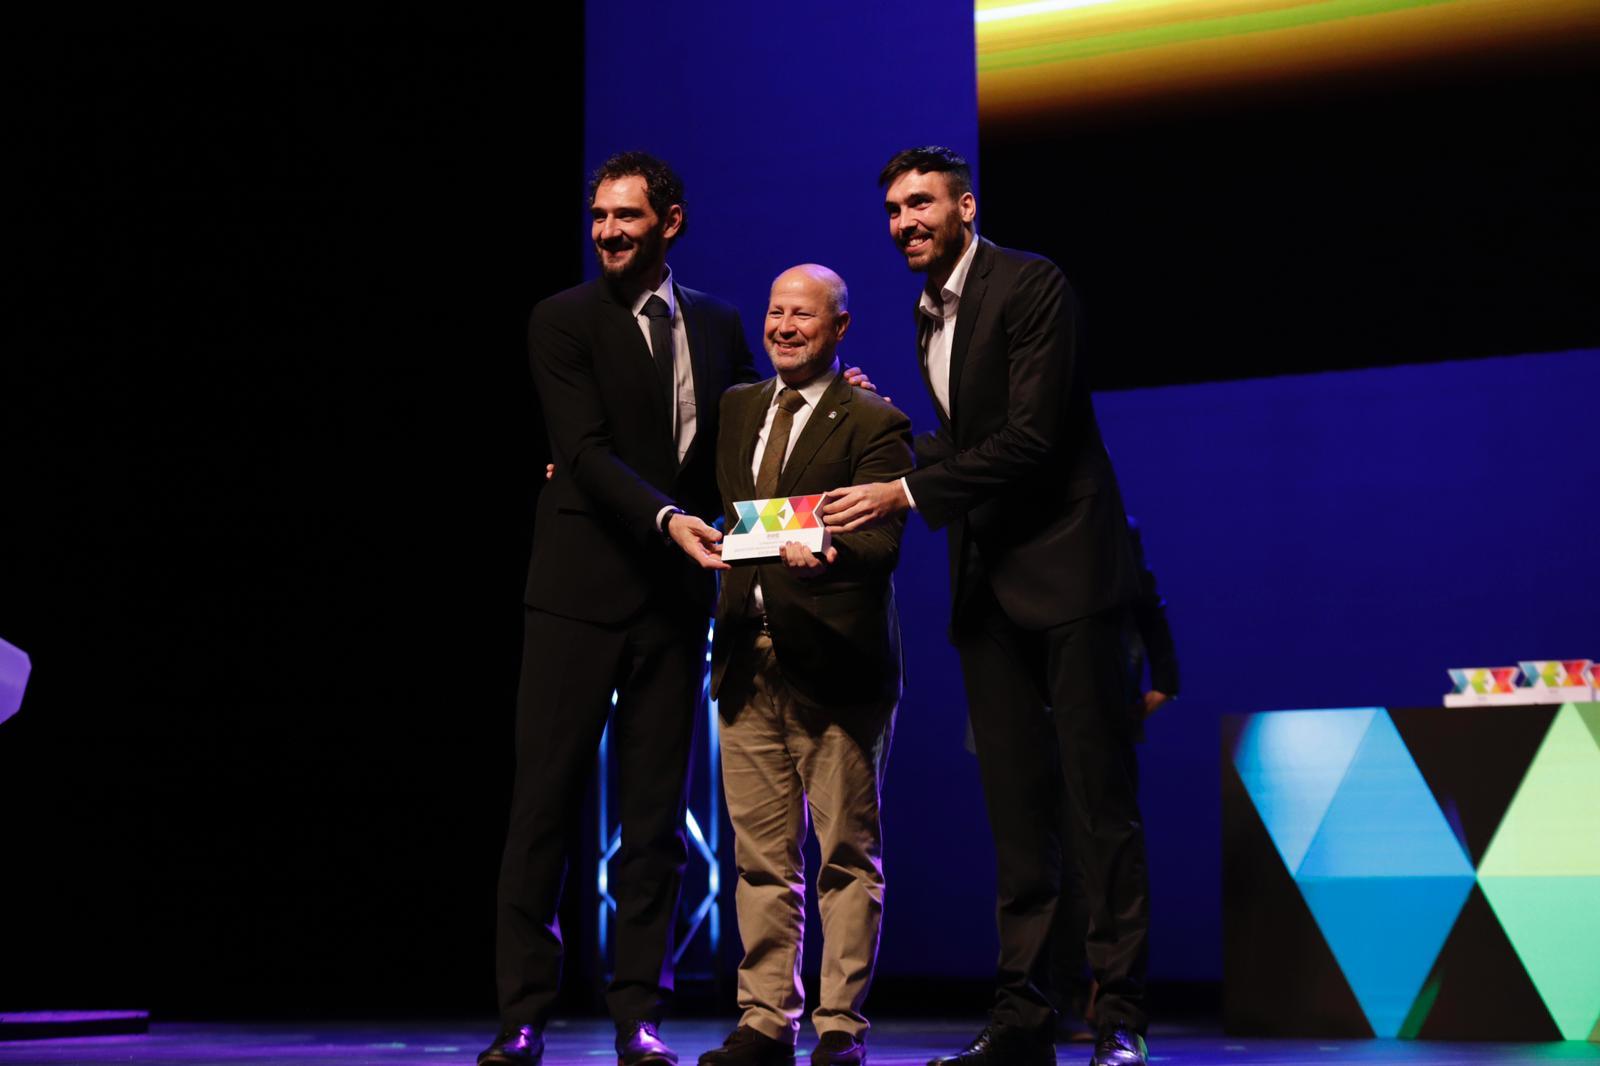 Jorge Garbajosa, Javier Imbroda y Pierre Oriola